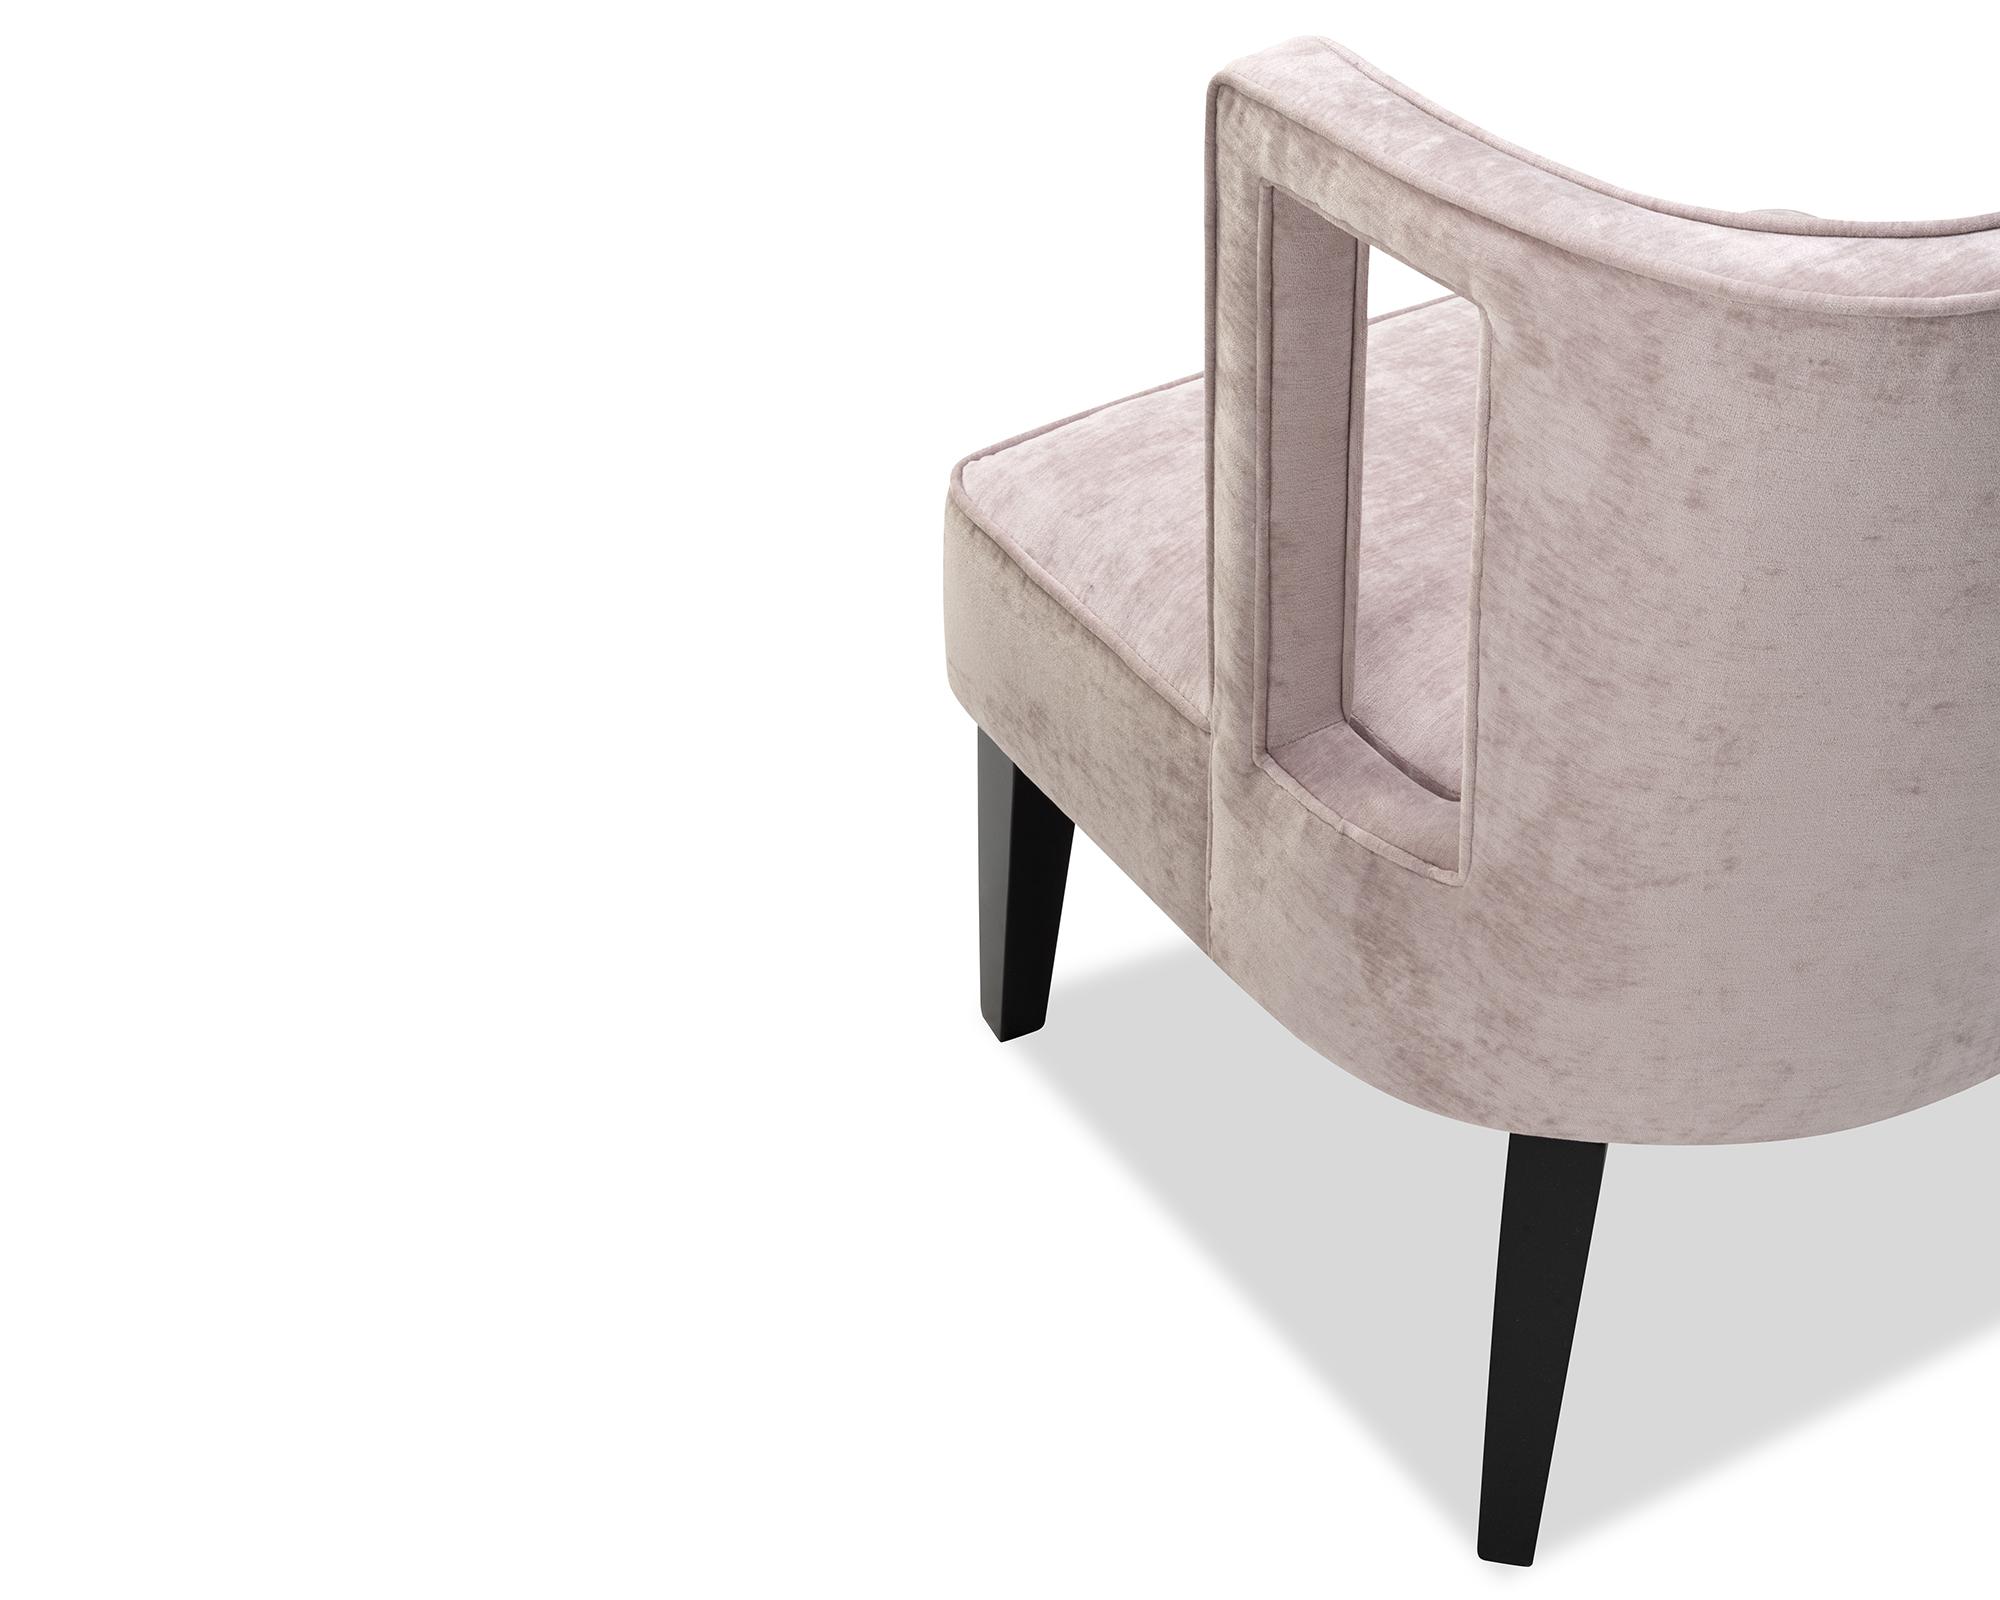 Liang & Eimil Cara Occasional Chair Lavender Velvet BH-OCH-083 (1)